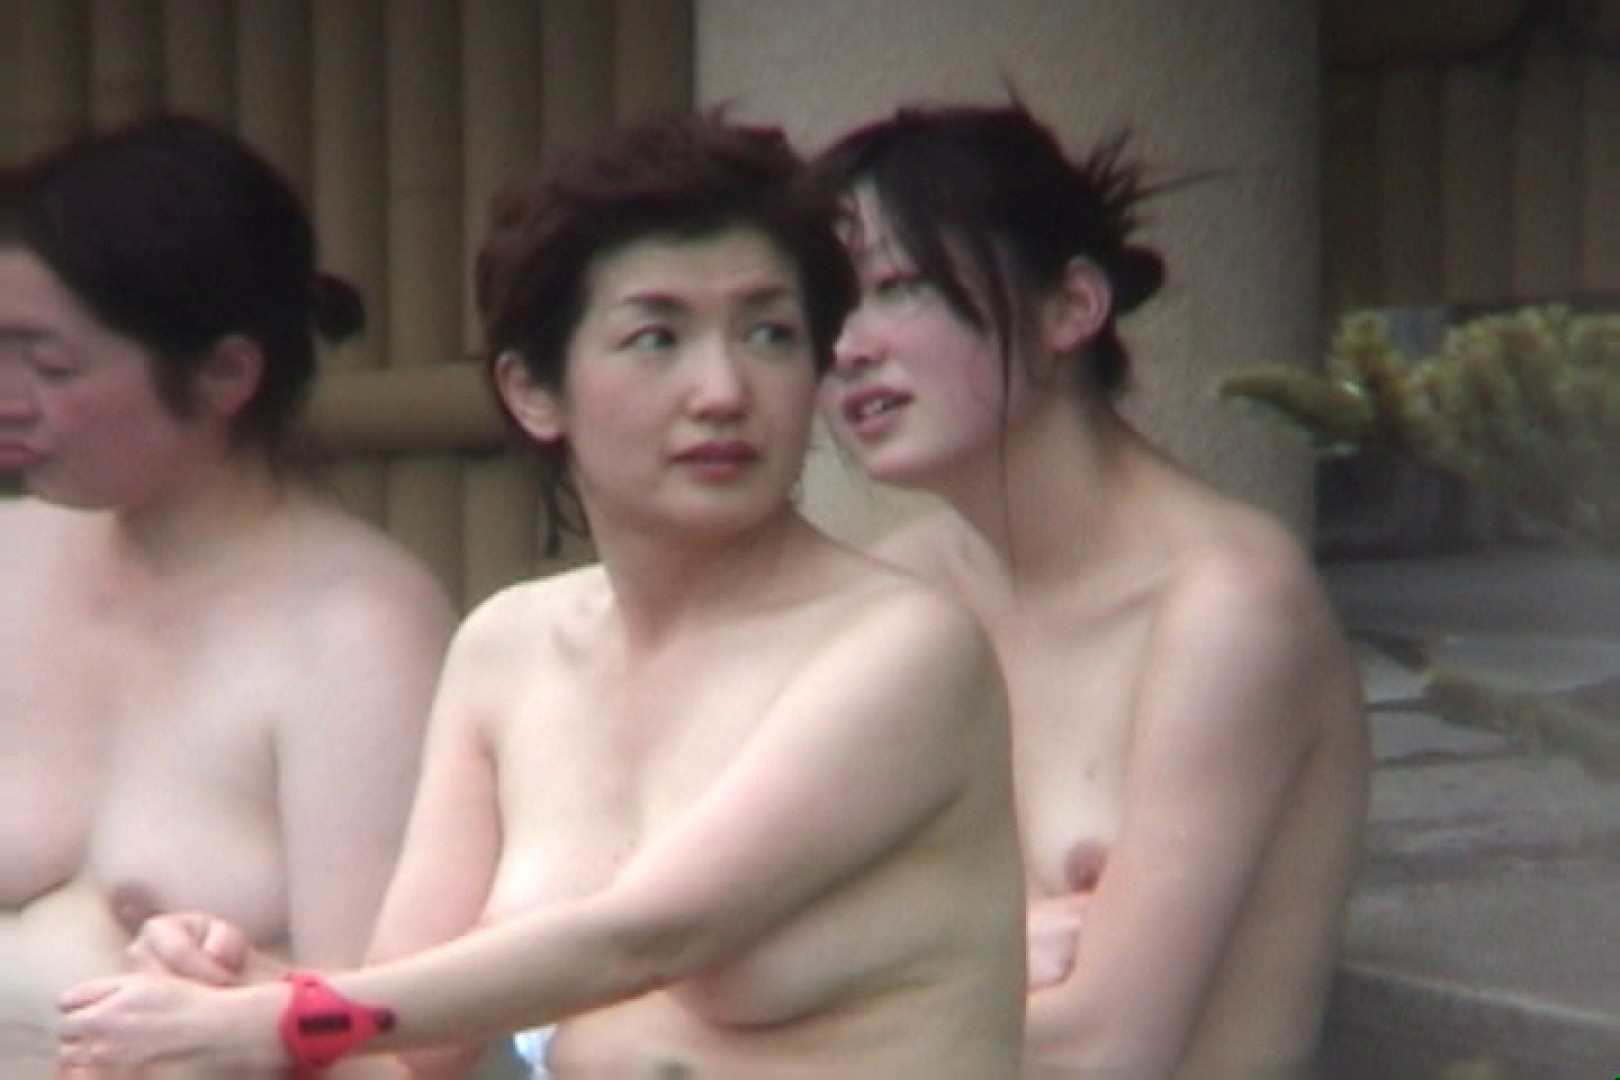 Aquaな露天風呂Vol.44【VIP限定】 OLセックス   盗撮  55画像 1